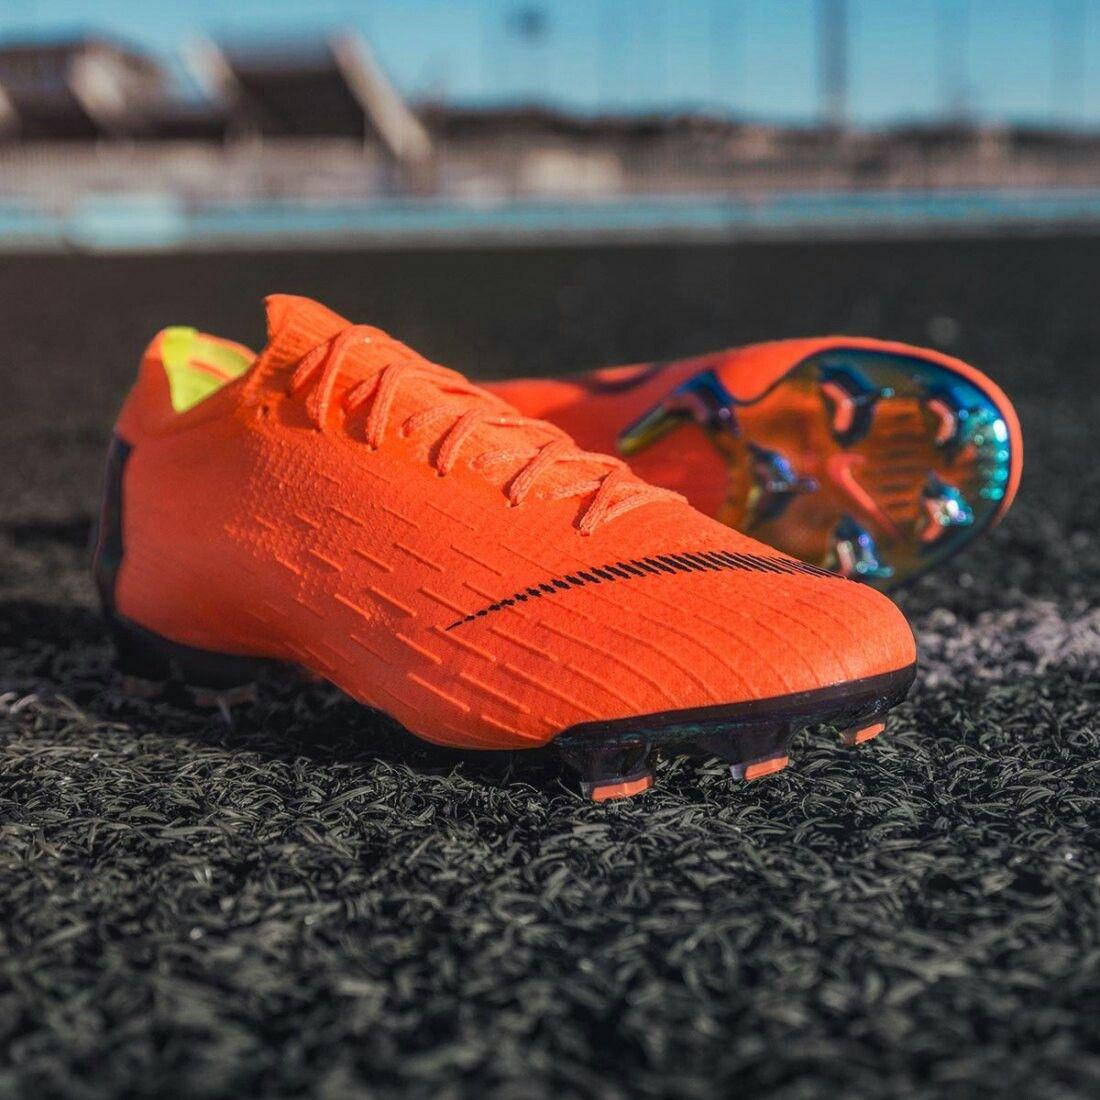 grupo Incorrecto Novedad  Pin by Jeet Choksi on Football Boots | Football boots, Nike football boots,  Soccer boots